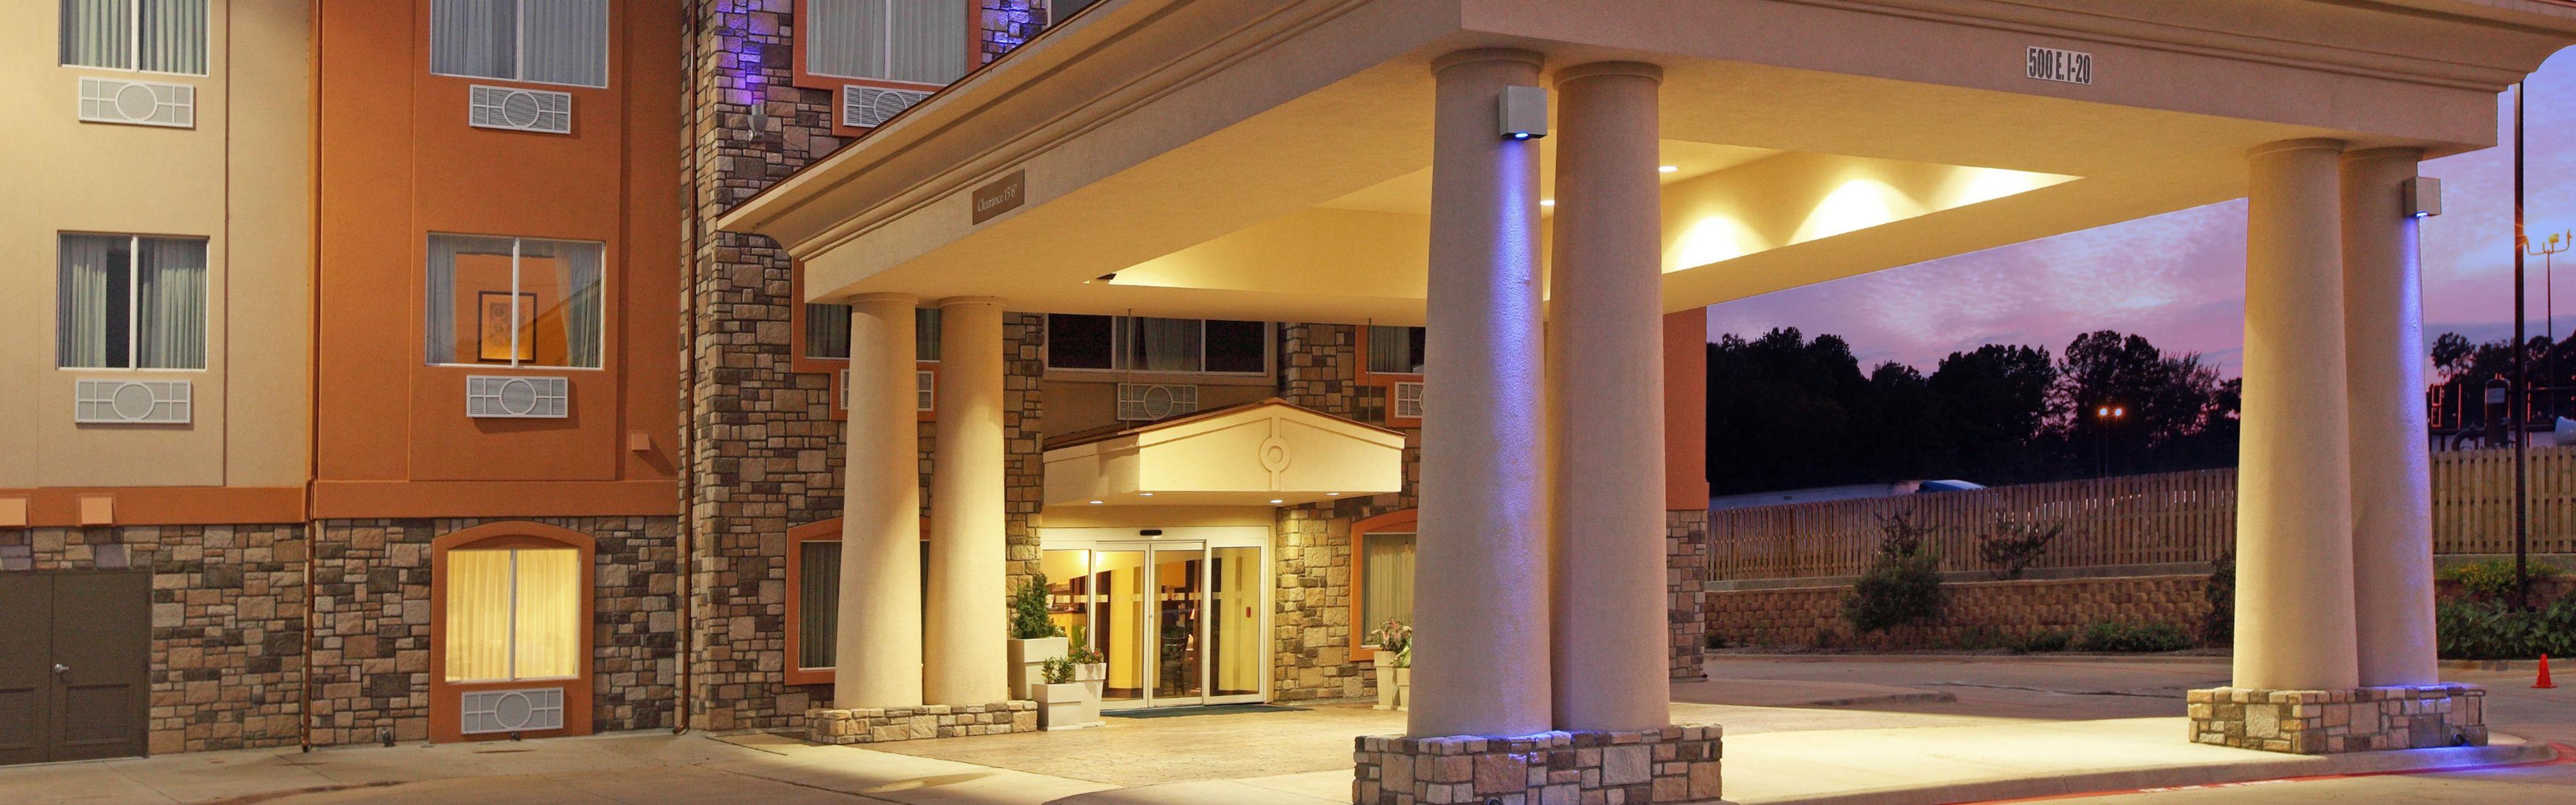 Marshall Texas Hotels Motels